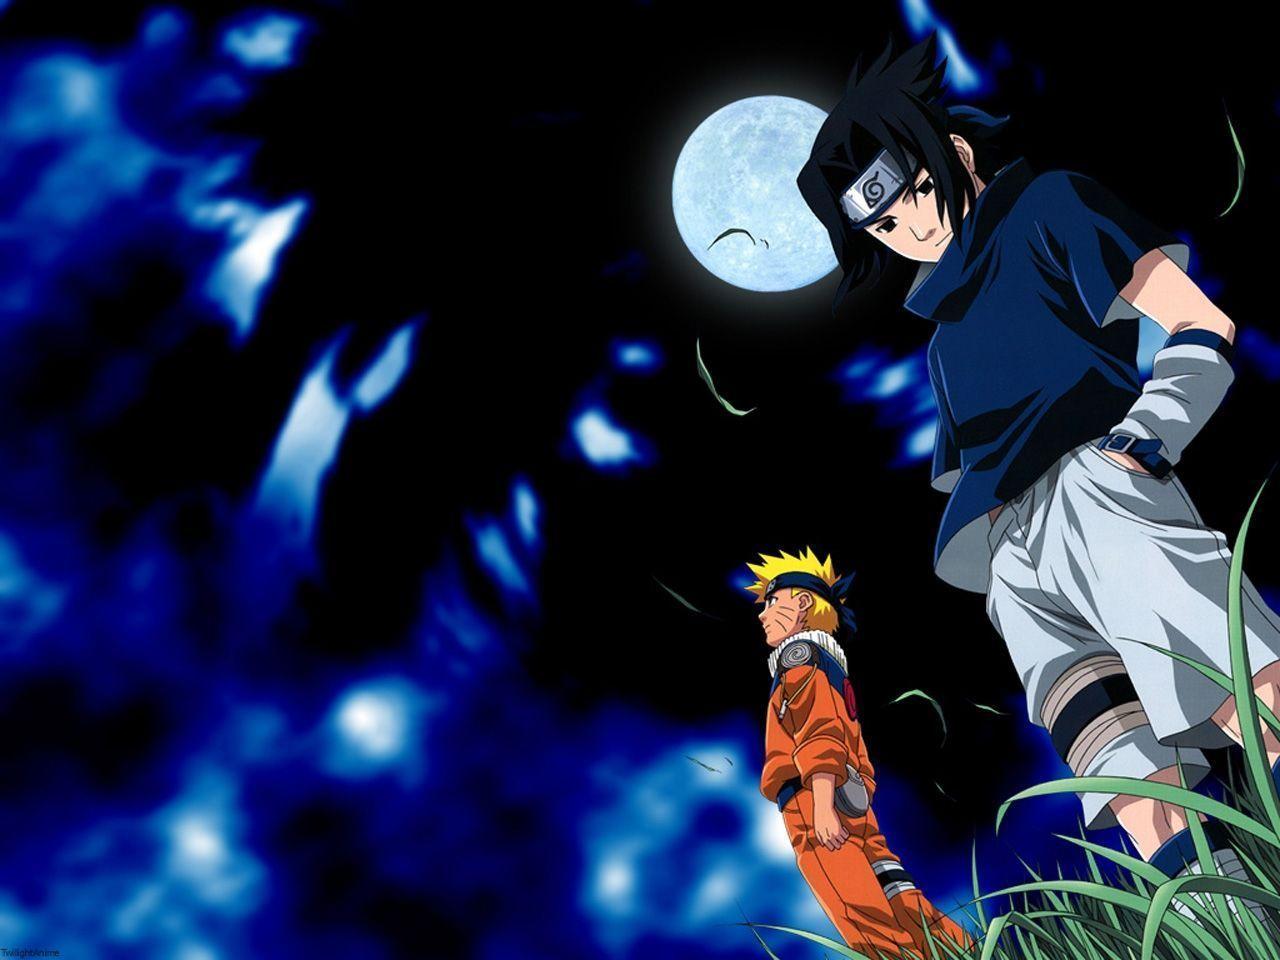 Sasuke Wallpapers Terbaru 2015 Wallpaper Cave Anime Naruto Wallpaper